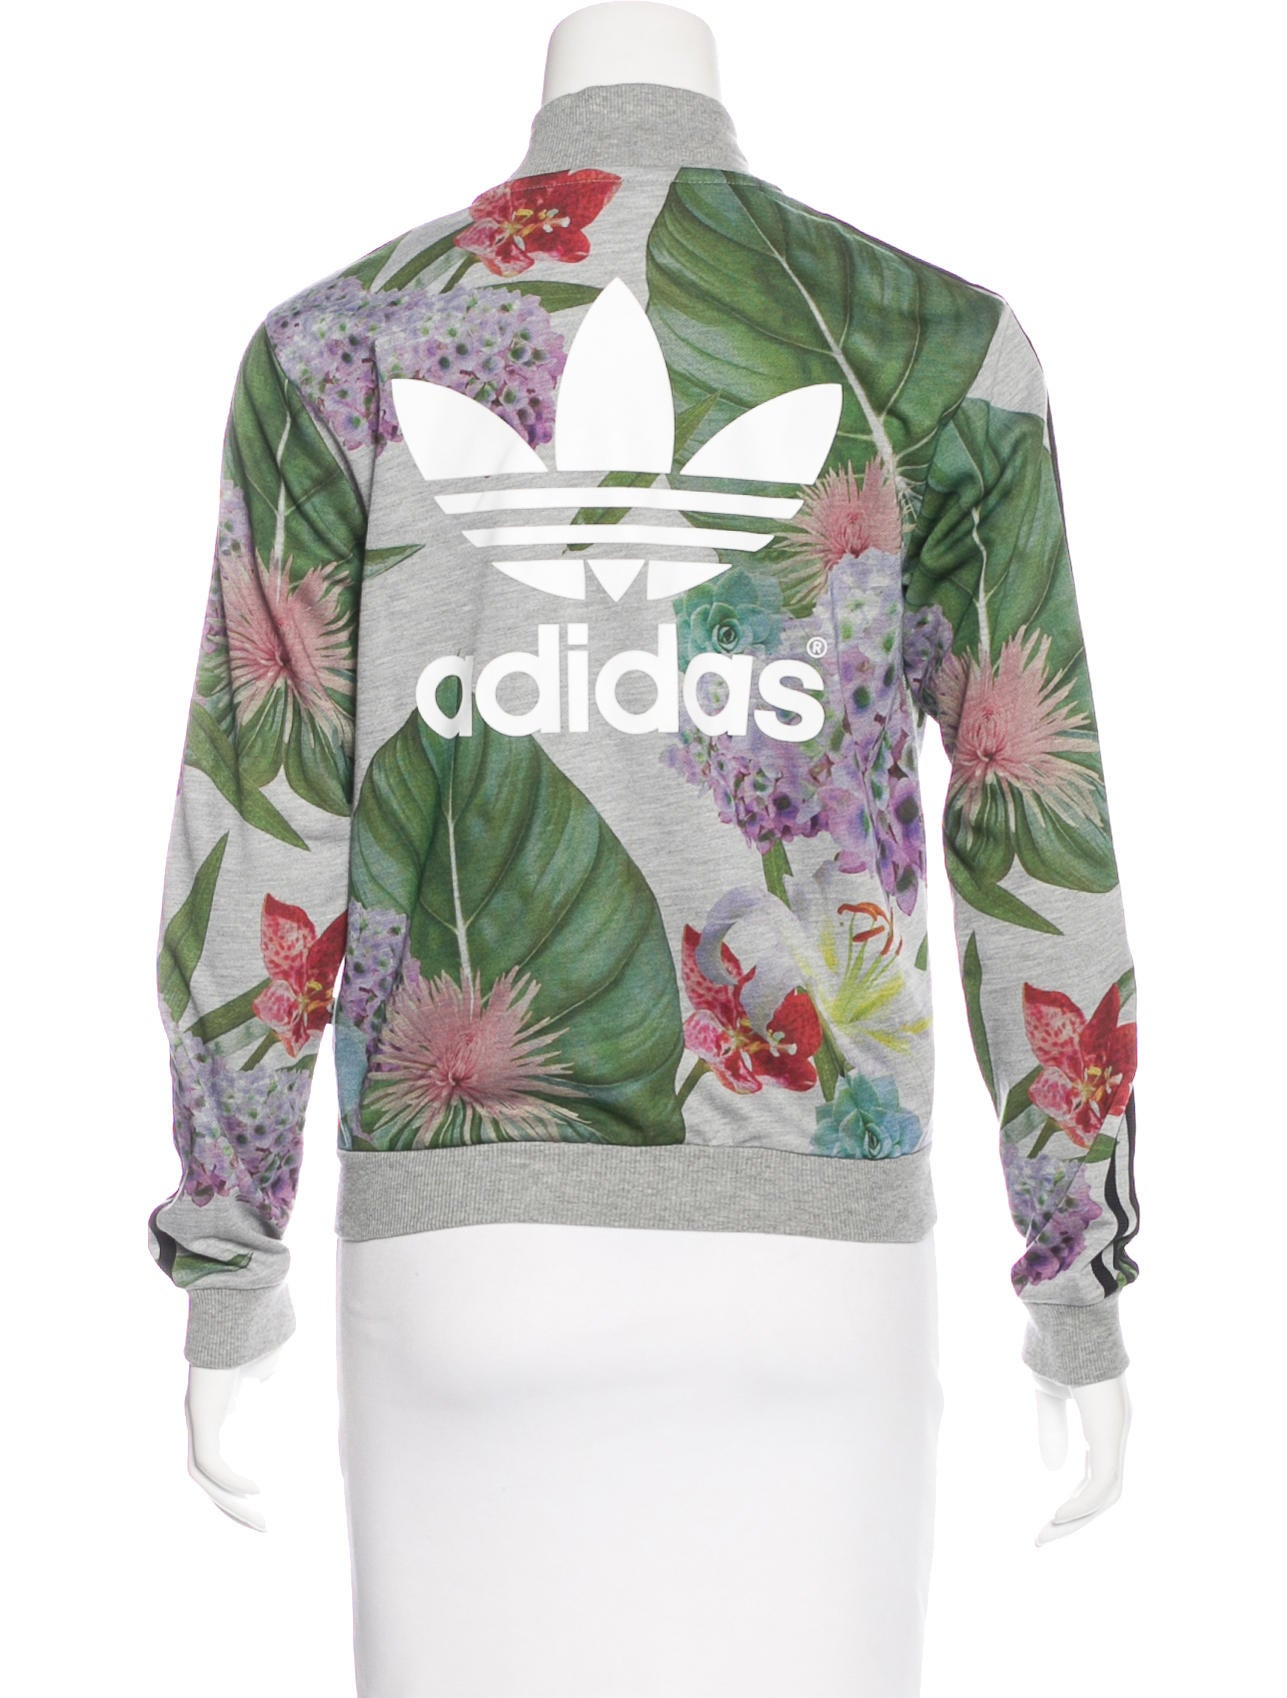 adidas floral print knit jacket - clothing